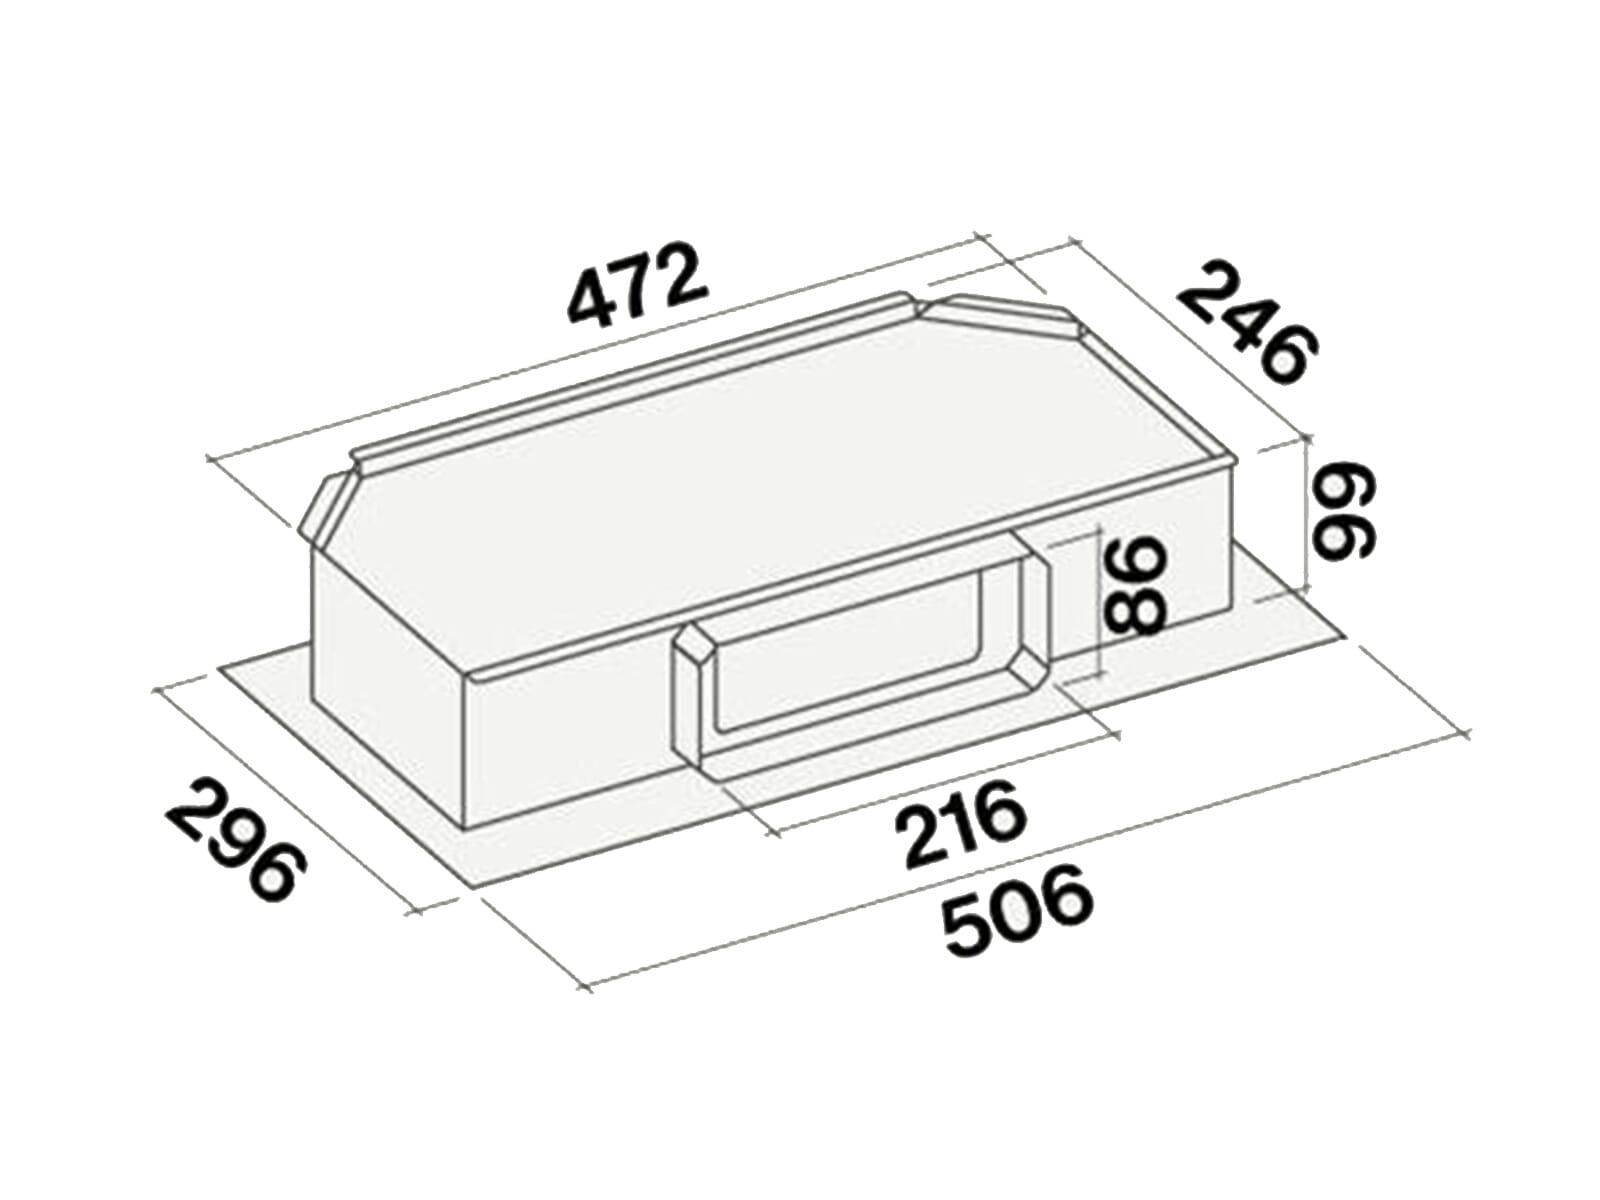 Falmec Downdraft Tischhaube Weiß